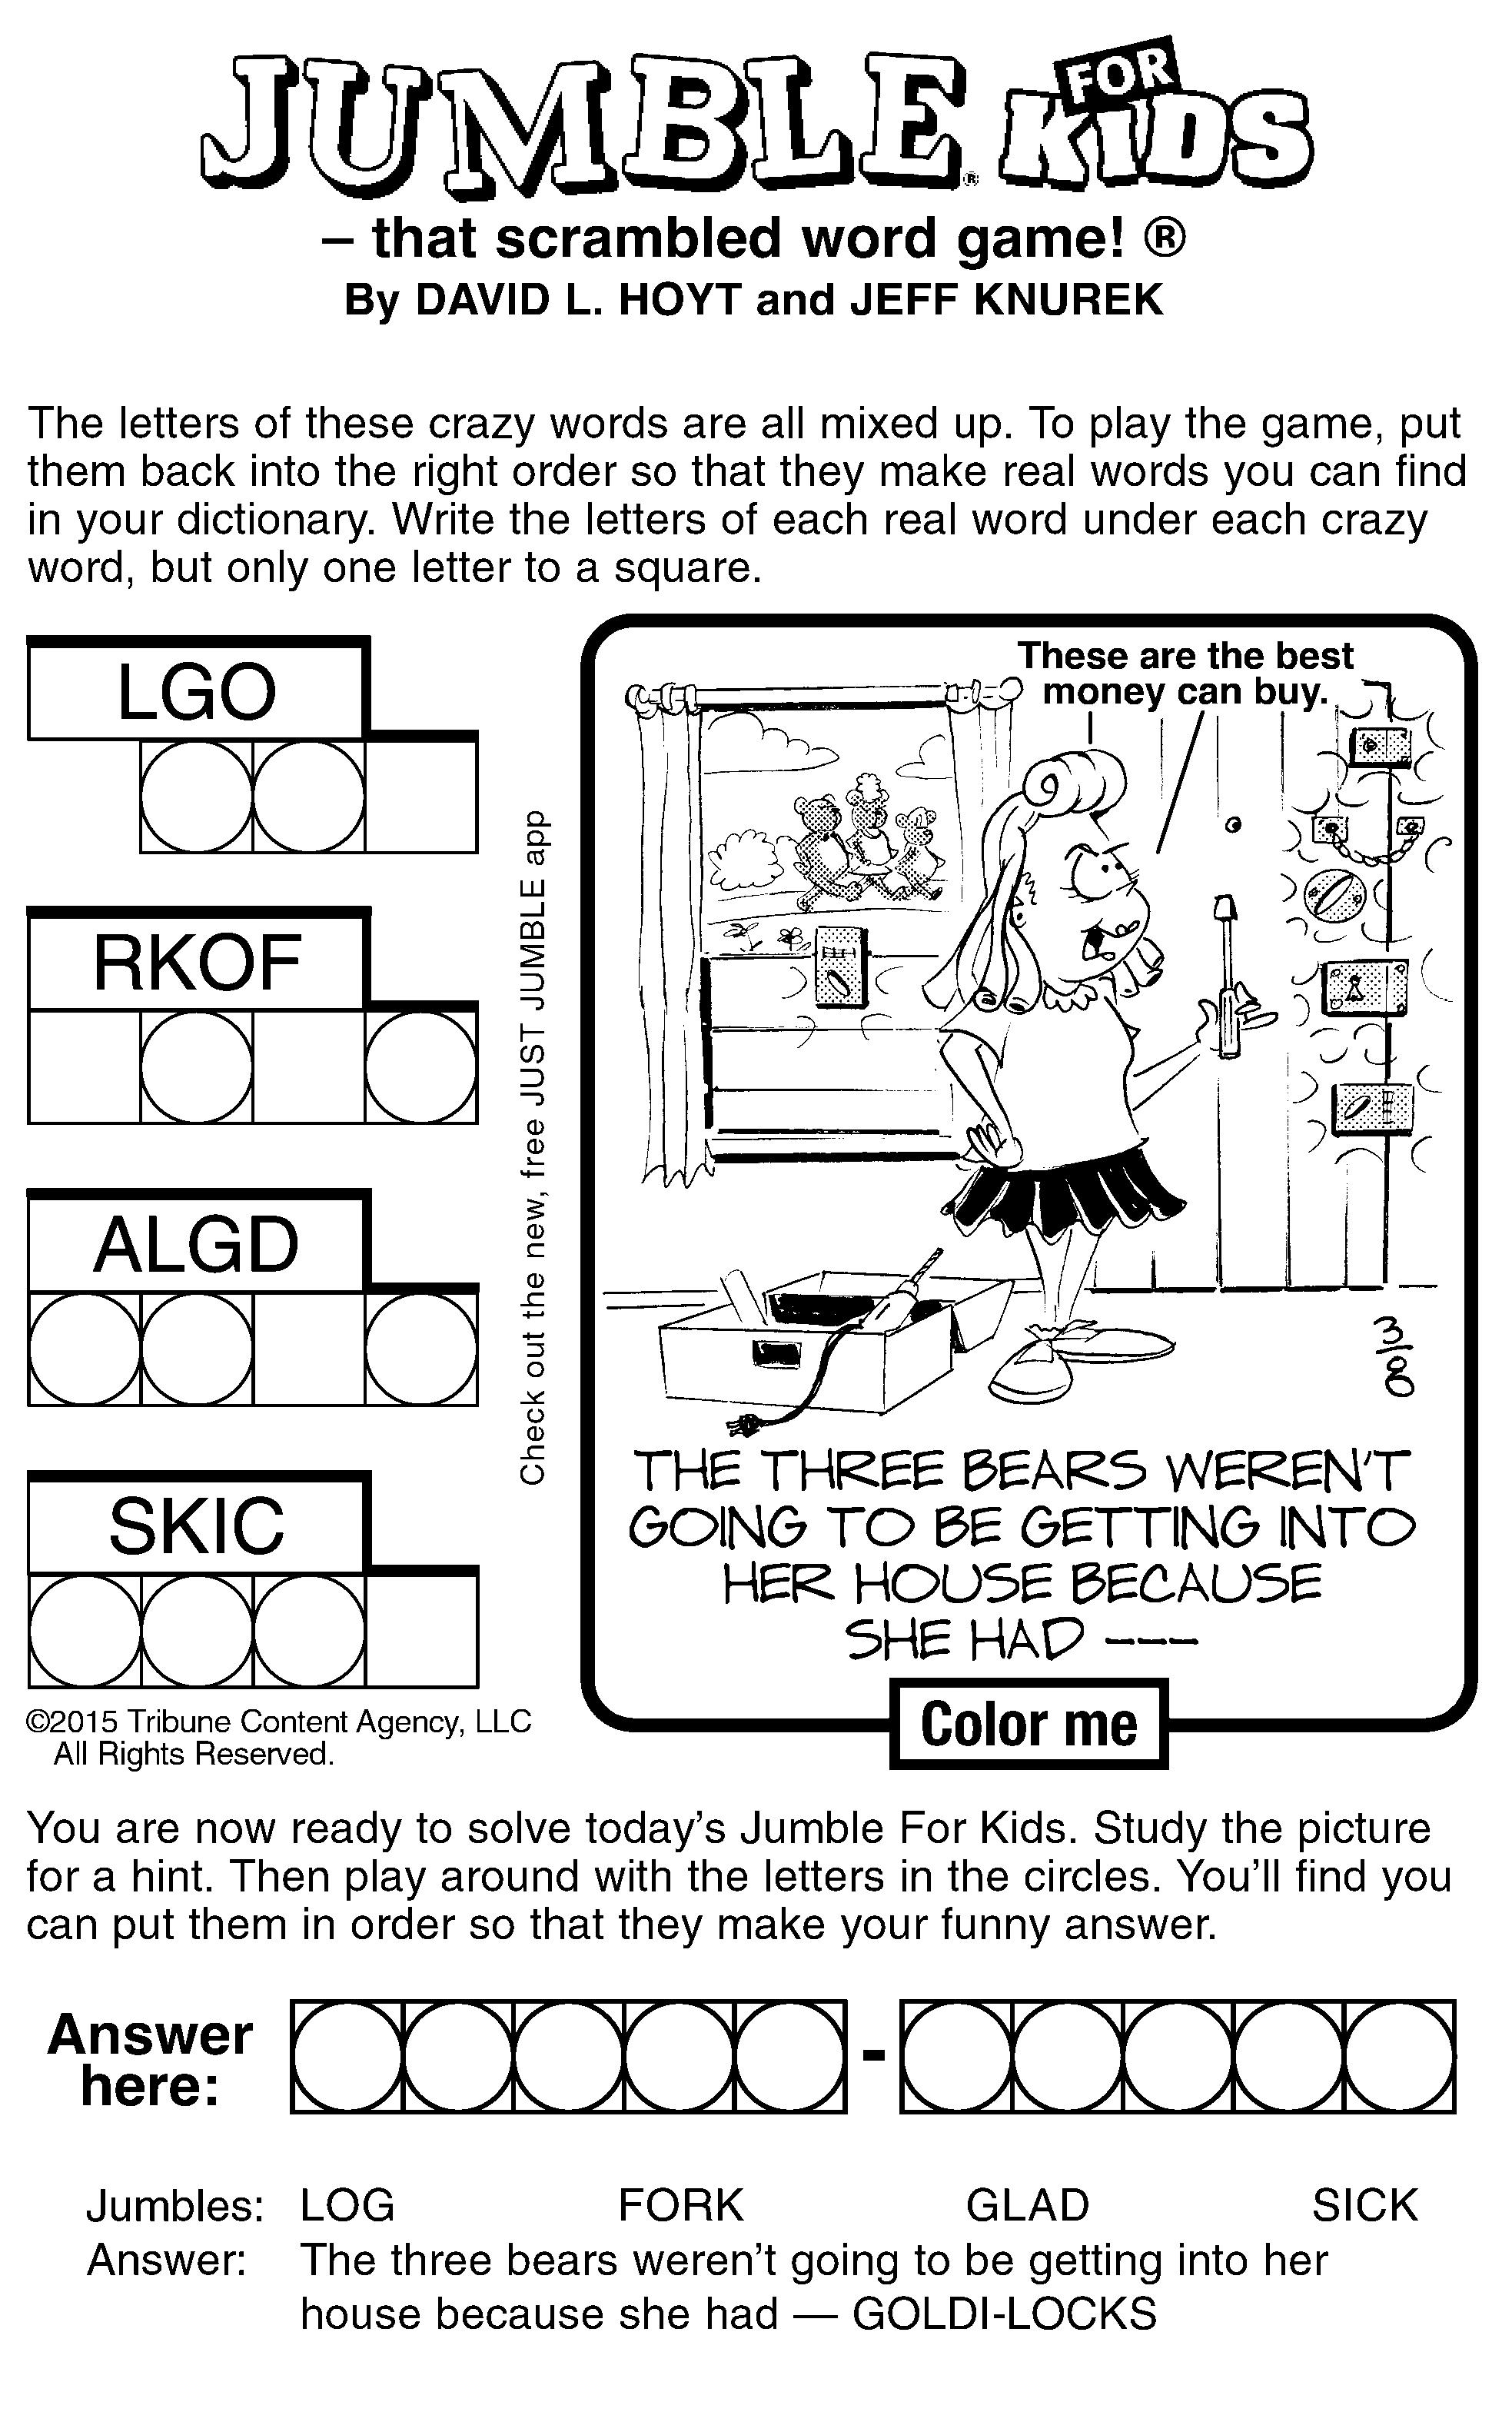 Sample Of Jumble For Kids